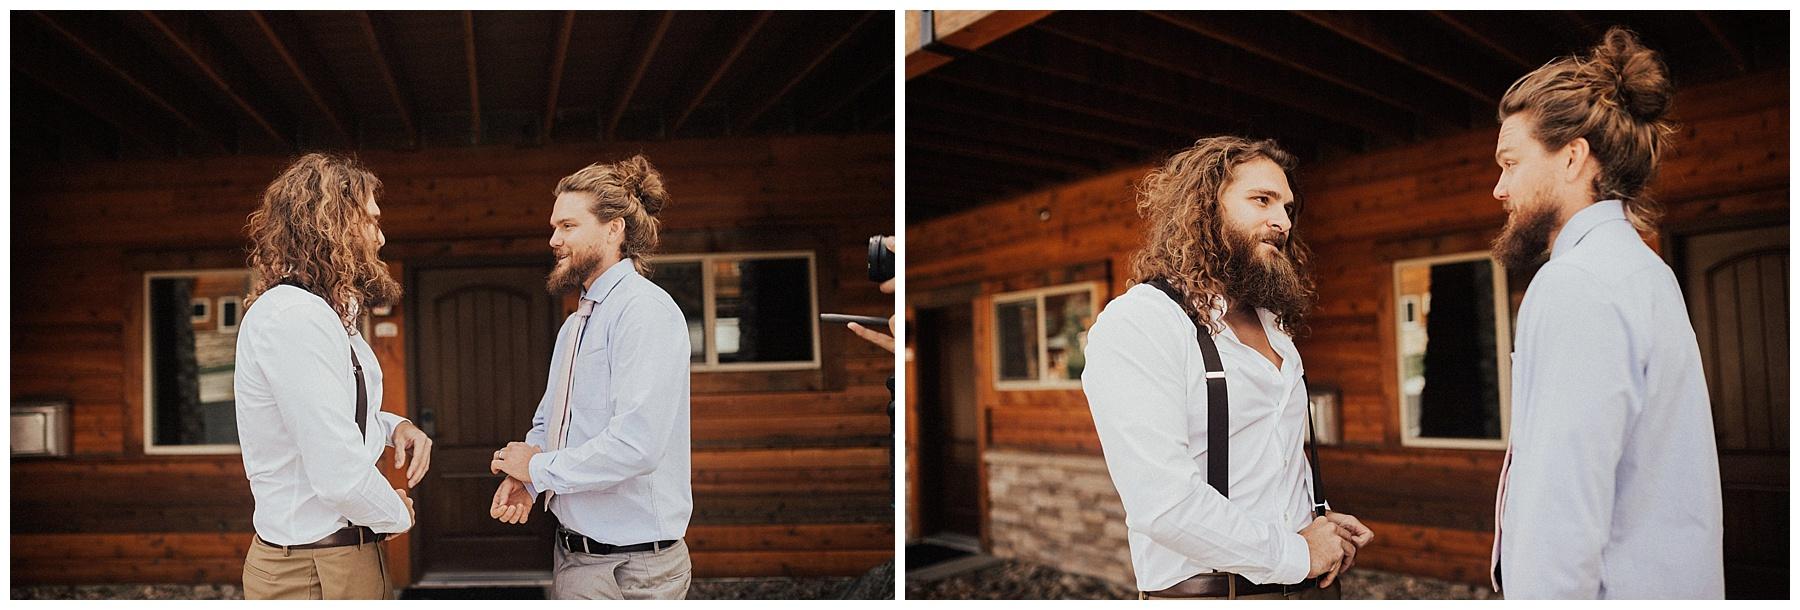 Colorado Destination Elopement Tampa Wedding Photographer-17.jpg